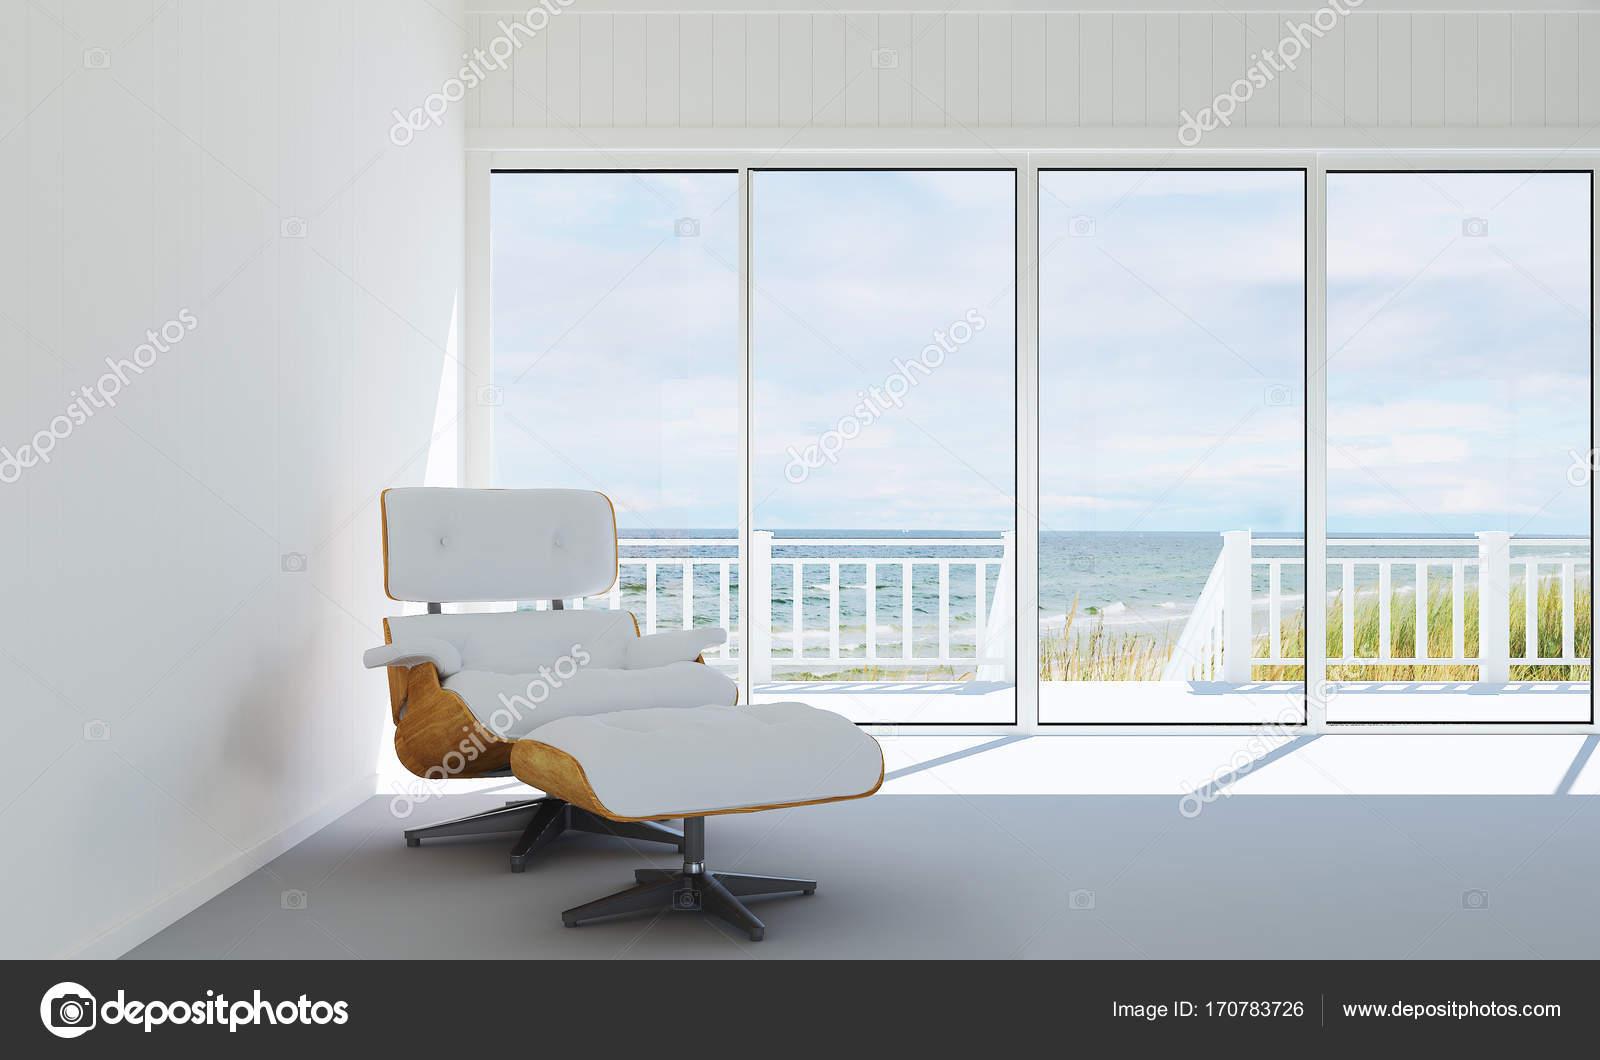 Lounge Stoel Woonkamer : Hij interieur van woonkamer lounge stoelen en houten muur textuur